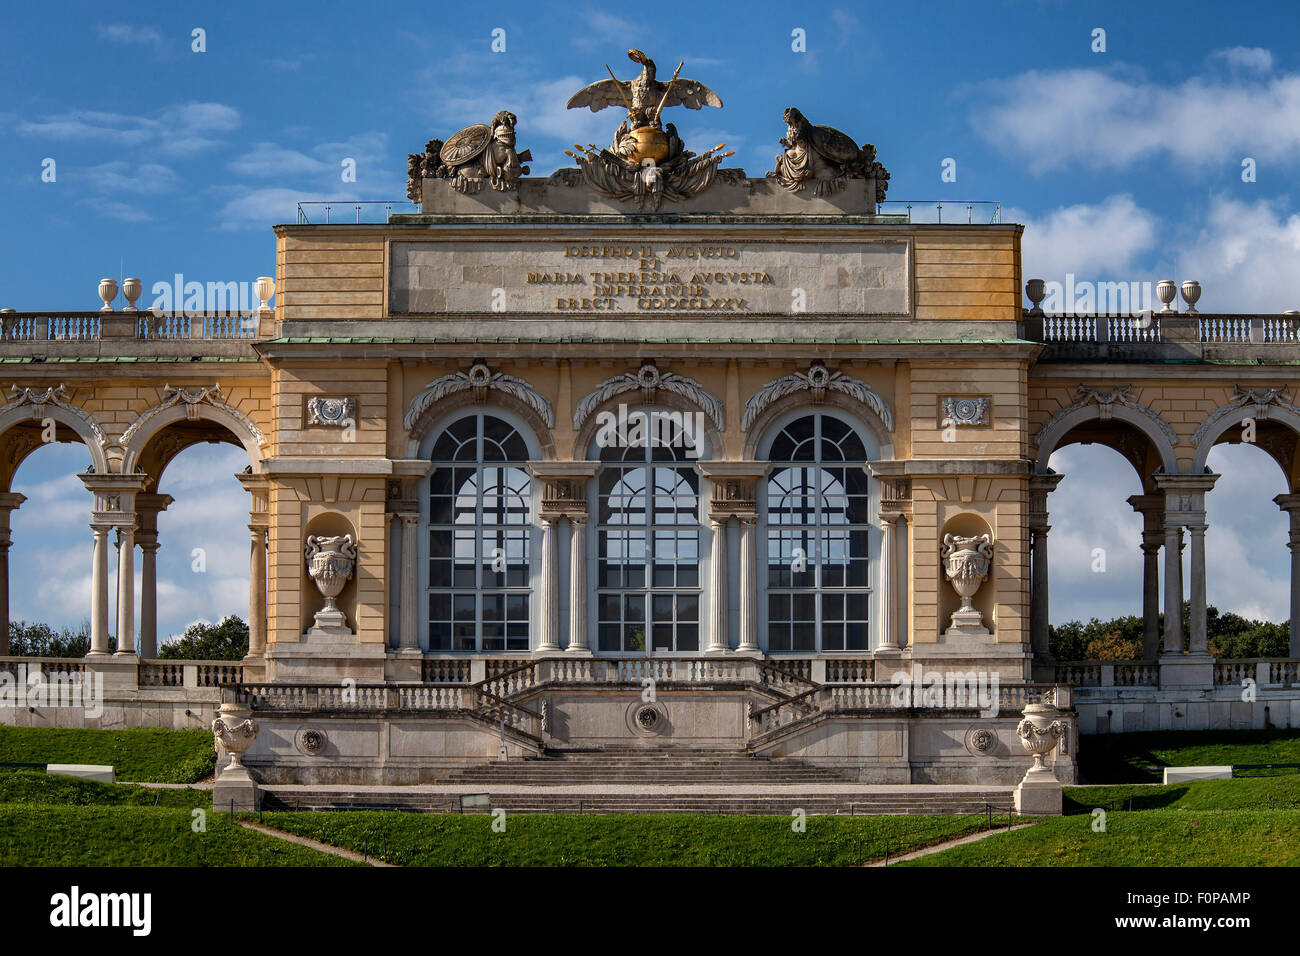 Gloriette building in the palace gardens Schloss Schoenbrunn palace, UNESCO World Heritage Site, Vienna, Austria, Europe Stock Photo